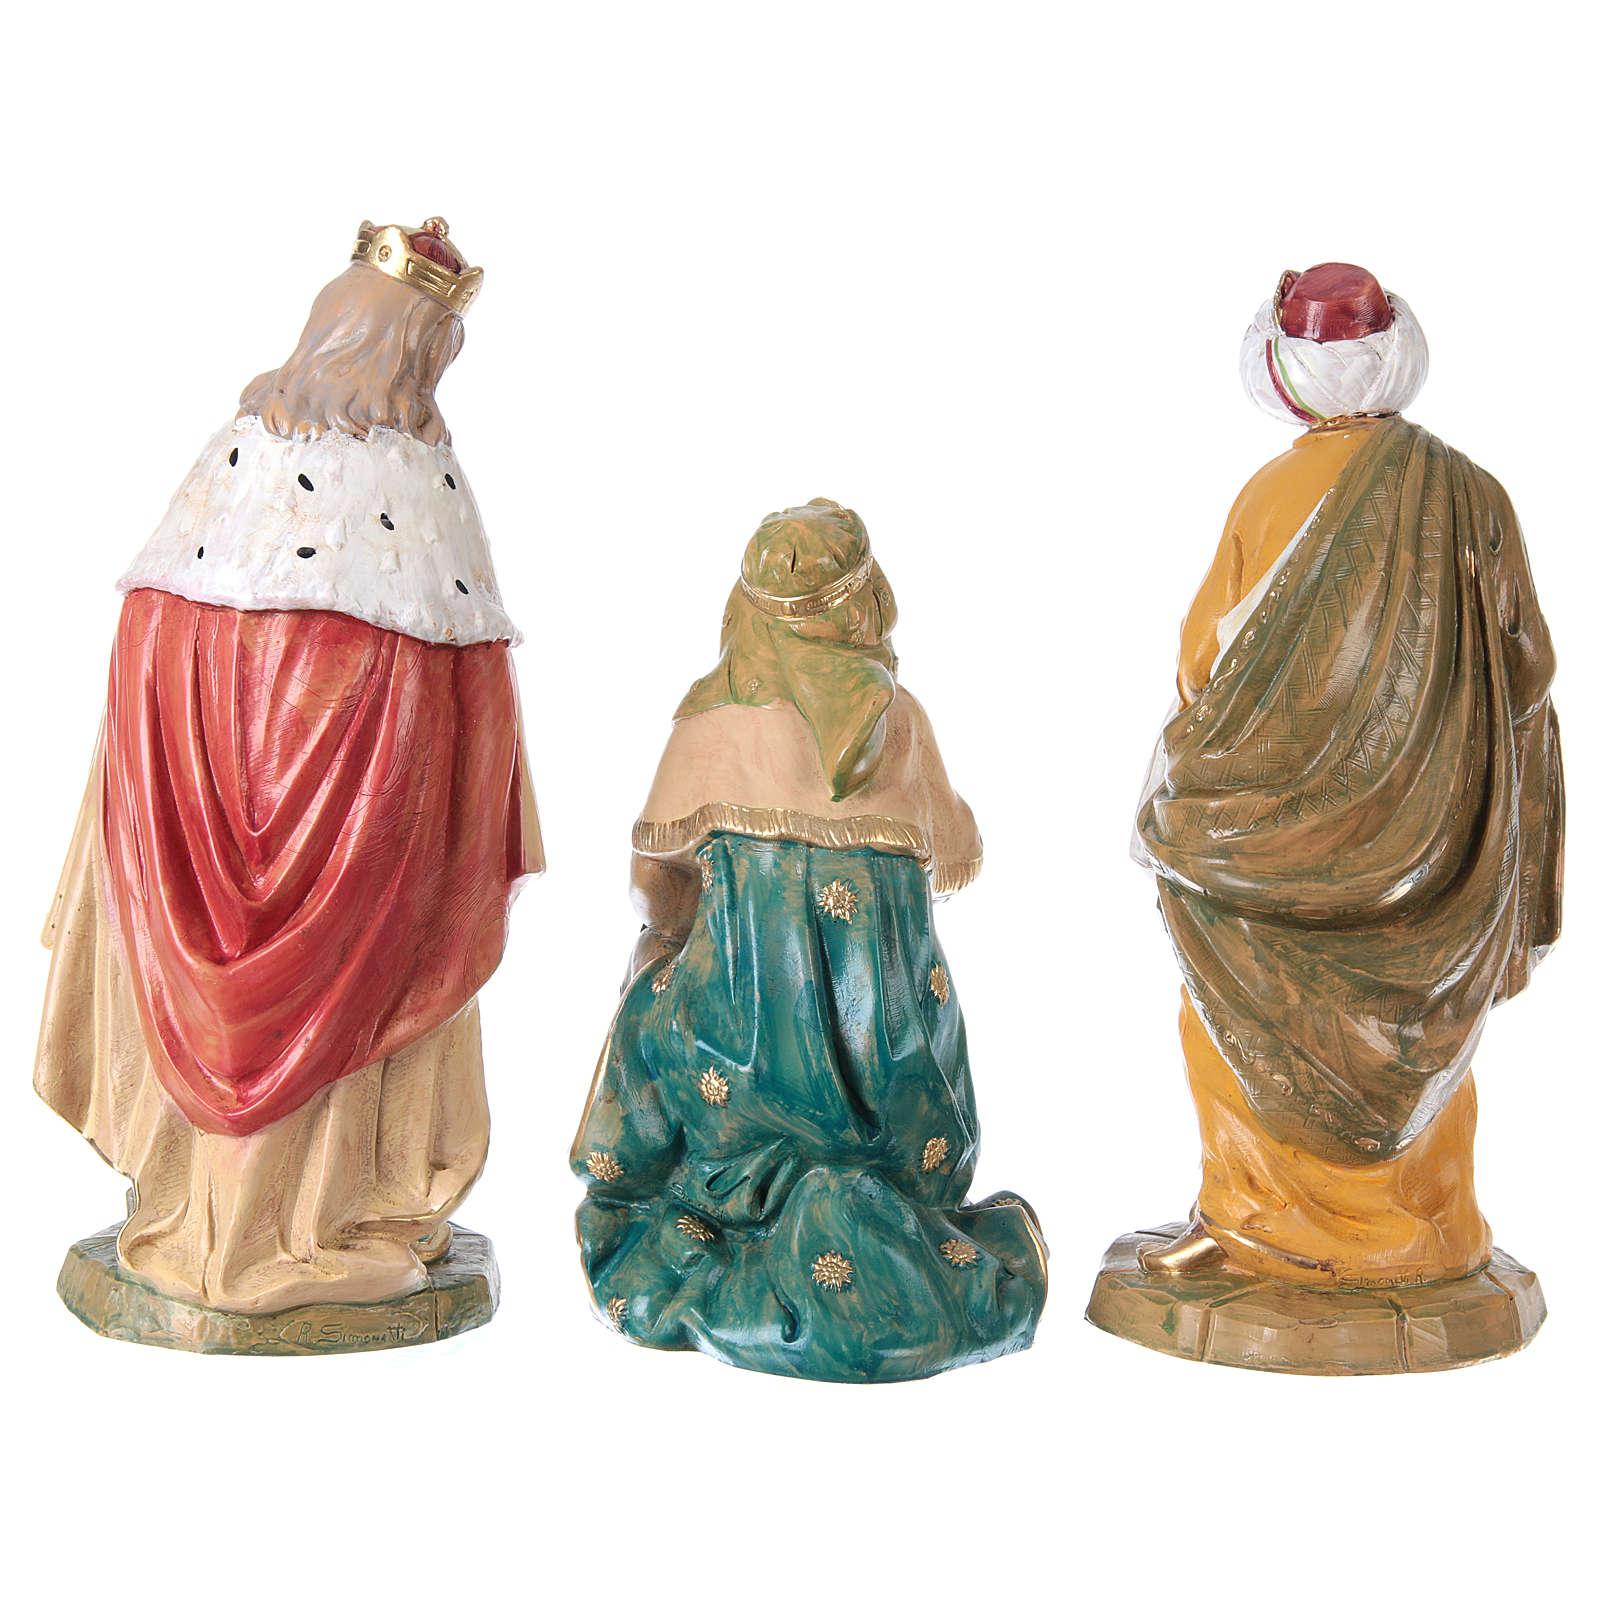 Presépio completo 8 figuras estilo tradicional altura média 30 cm 4